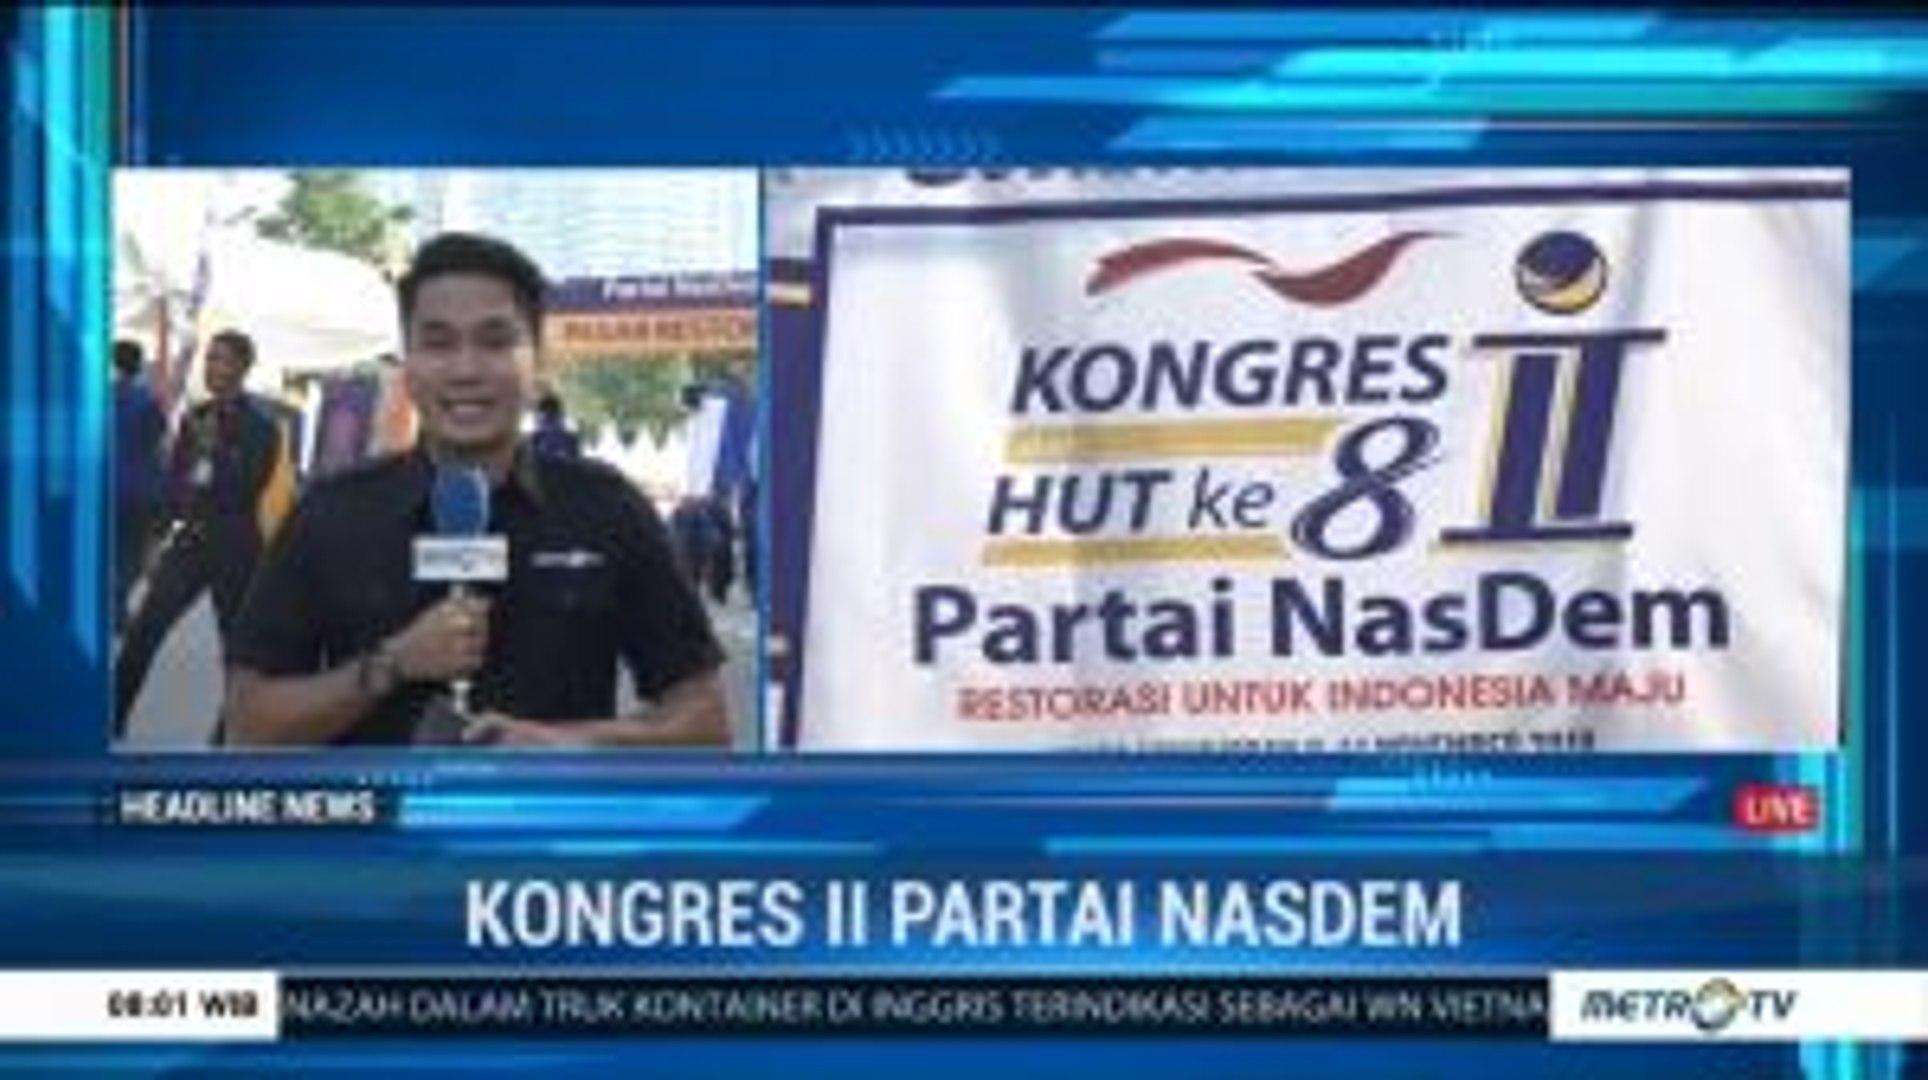 Partai NasDem akan Gelar Rapat Pleno di Kongres II Hari Ini